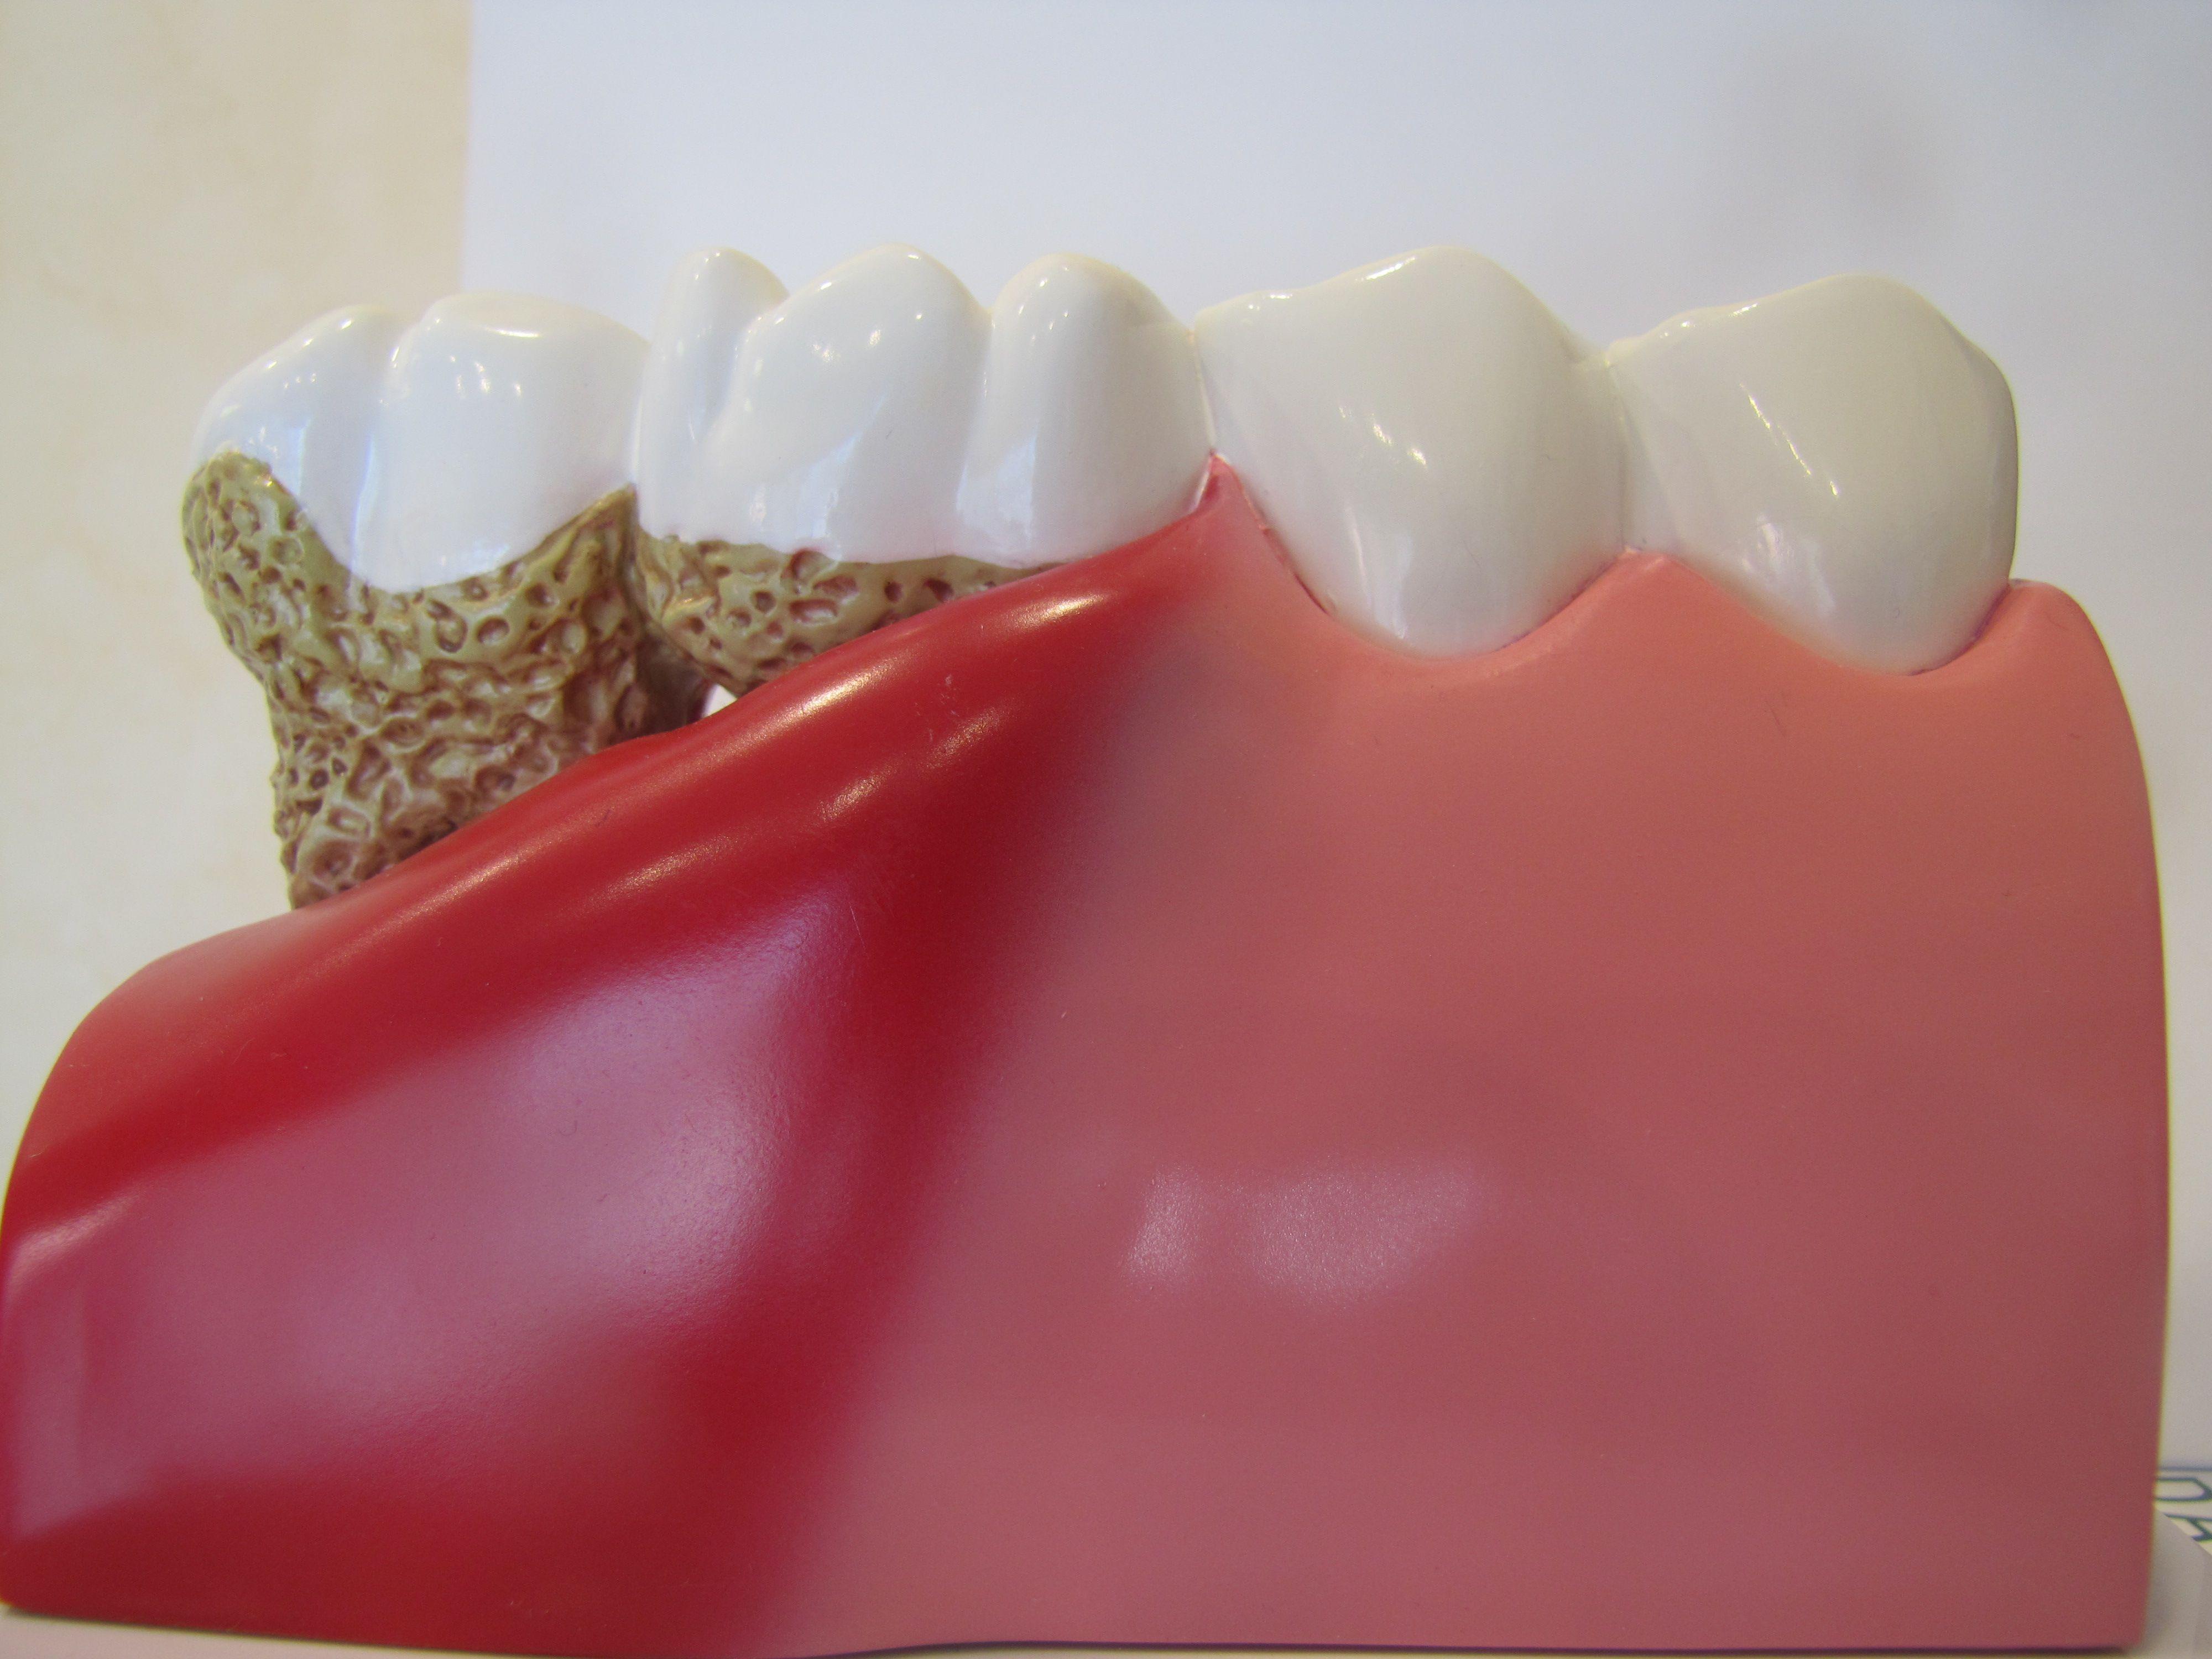 Dentoform Model Comparison Of Periodontal Disease Vs Healthy Gingiva